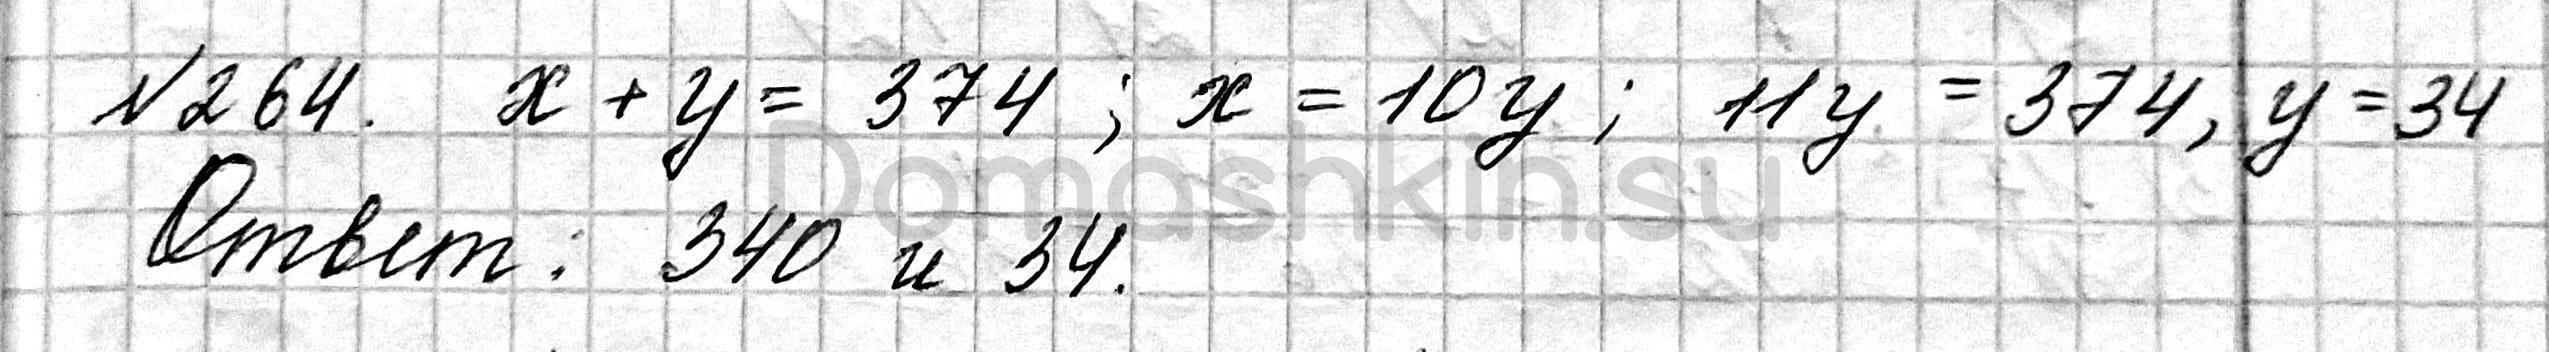 Математика 6 класс учебник Мерзляк номер 264 решение